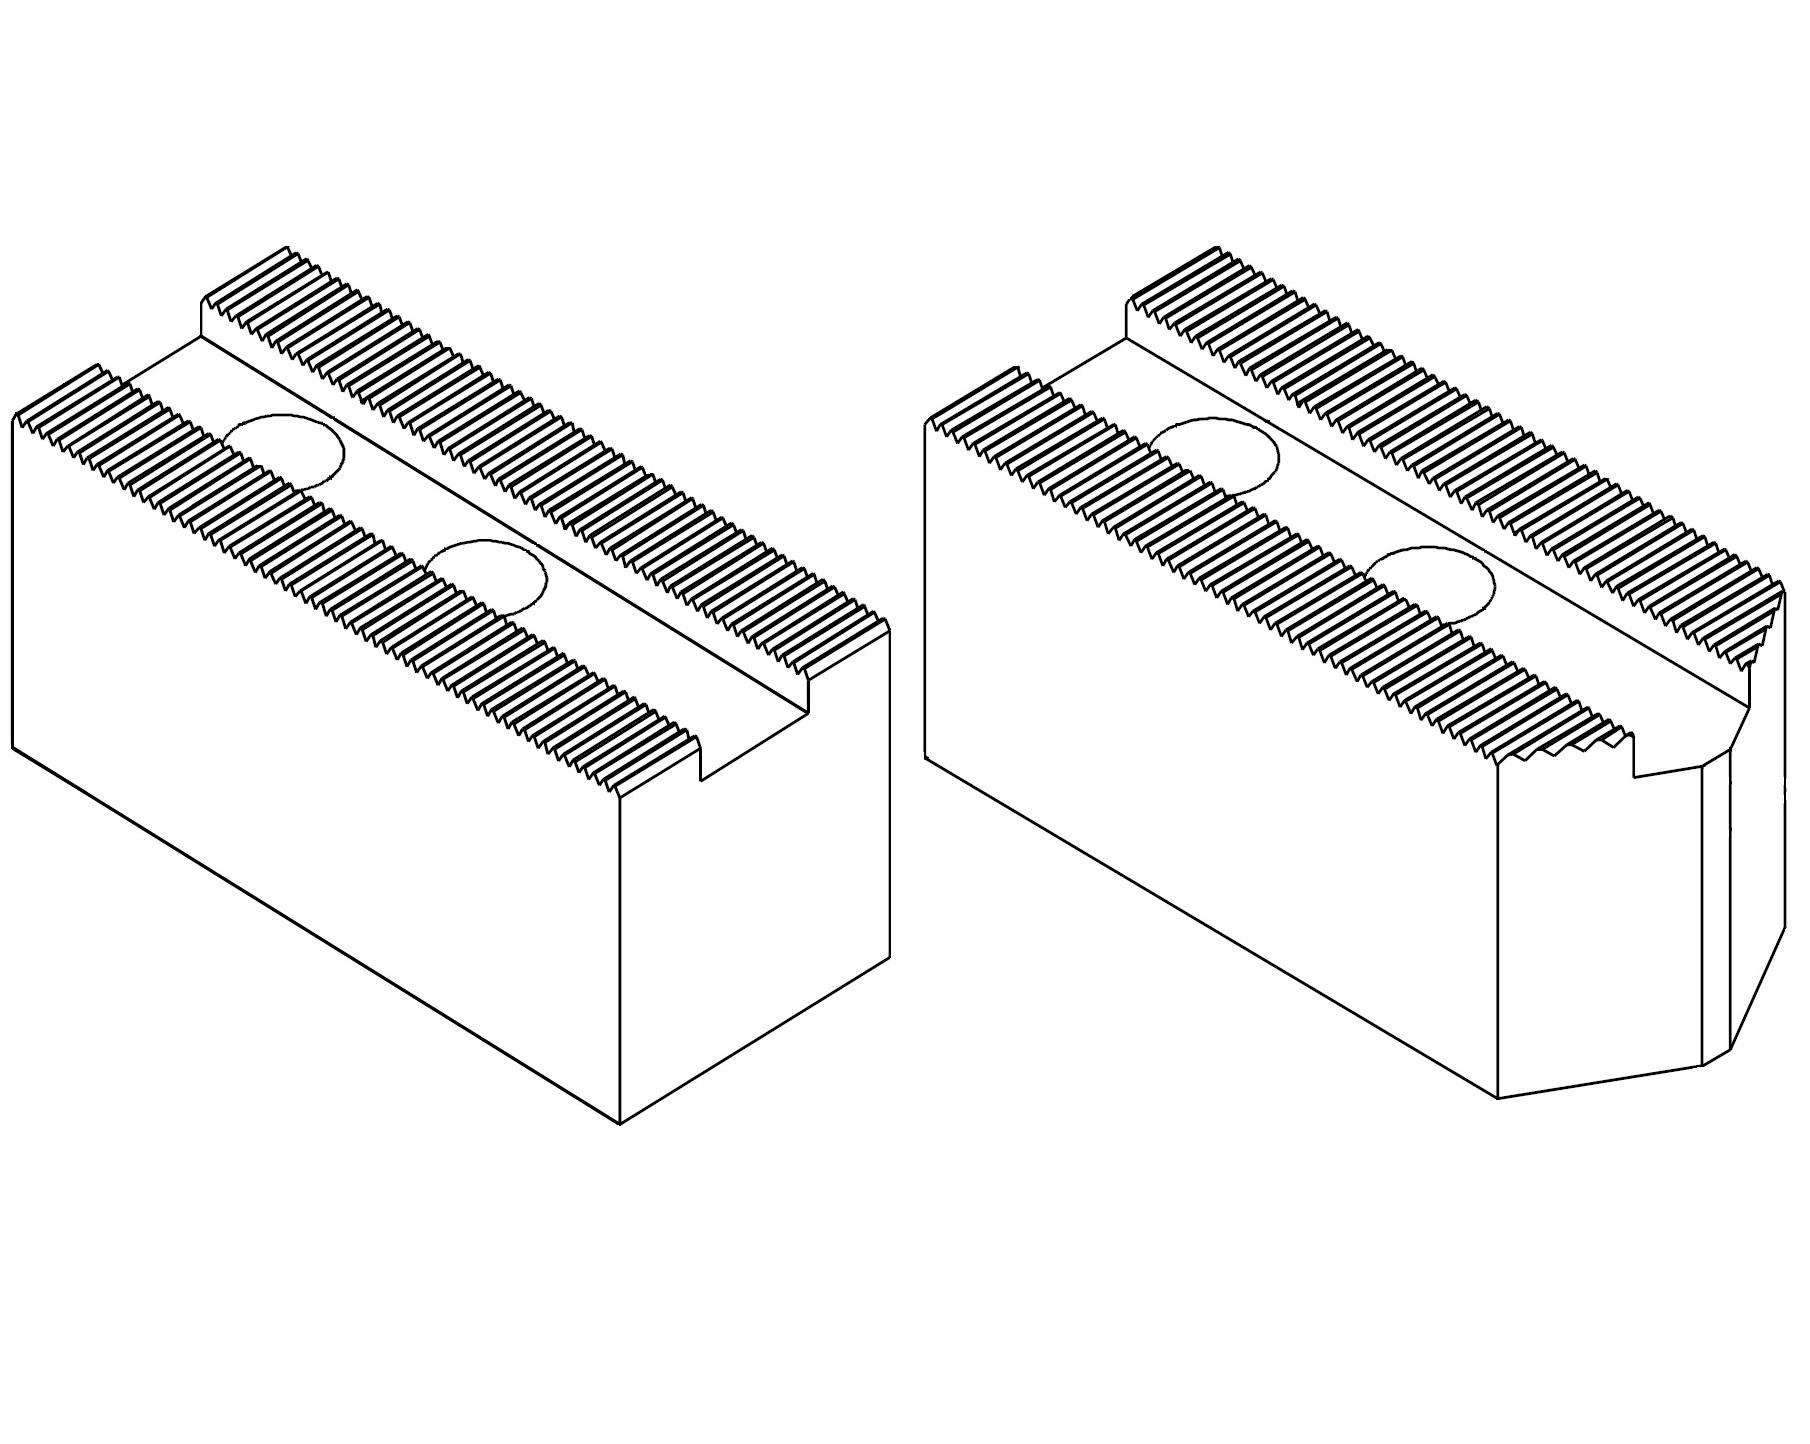 "Čelisti měkké 1/16""x90°, šířka drážky - 14 (sklíčidla pr. 160 - 315 mm)"